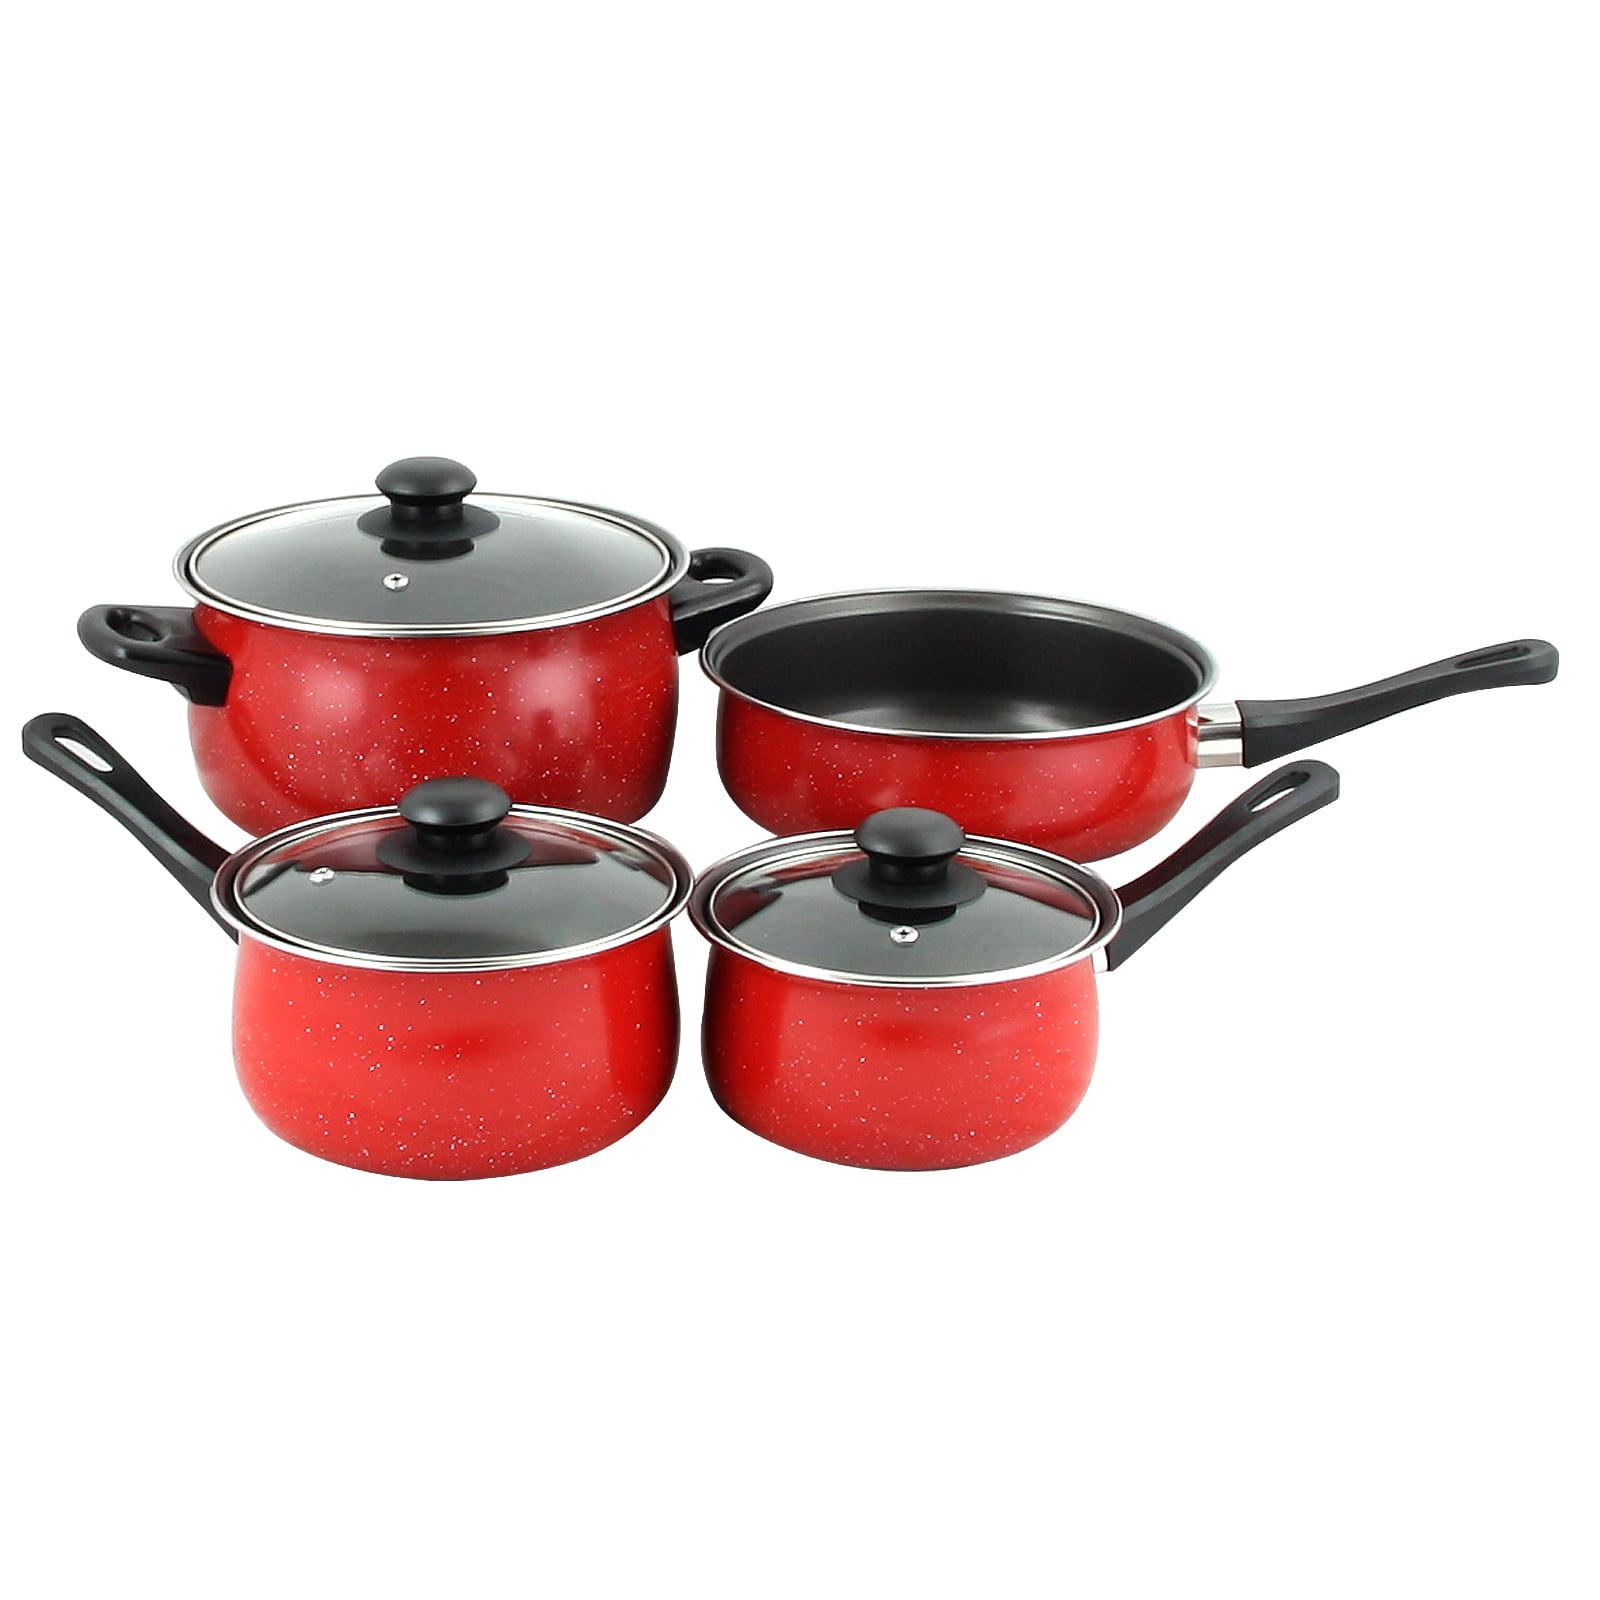 Gibson Home Casselman 7 piece Cookware Set in Red with Bakelite Snow Handle